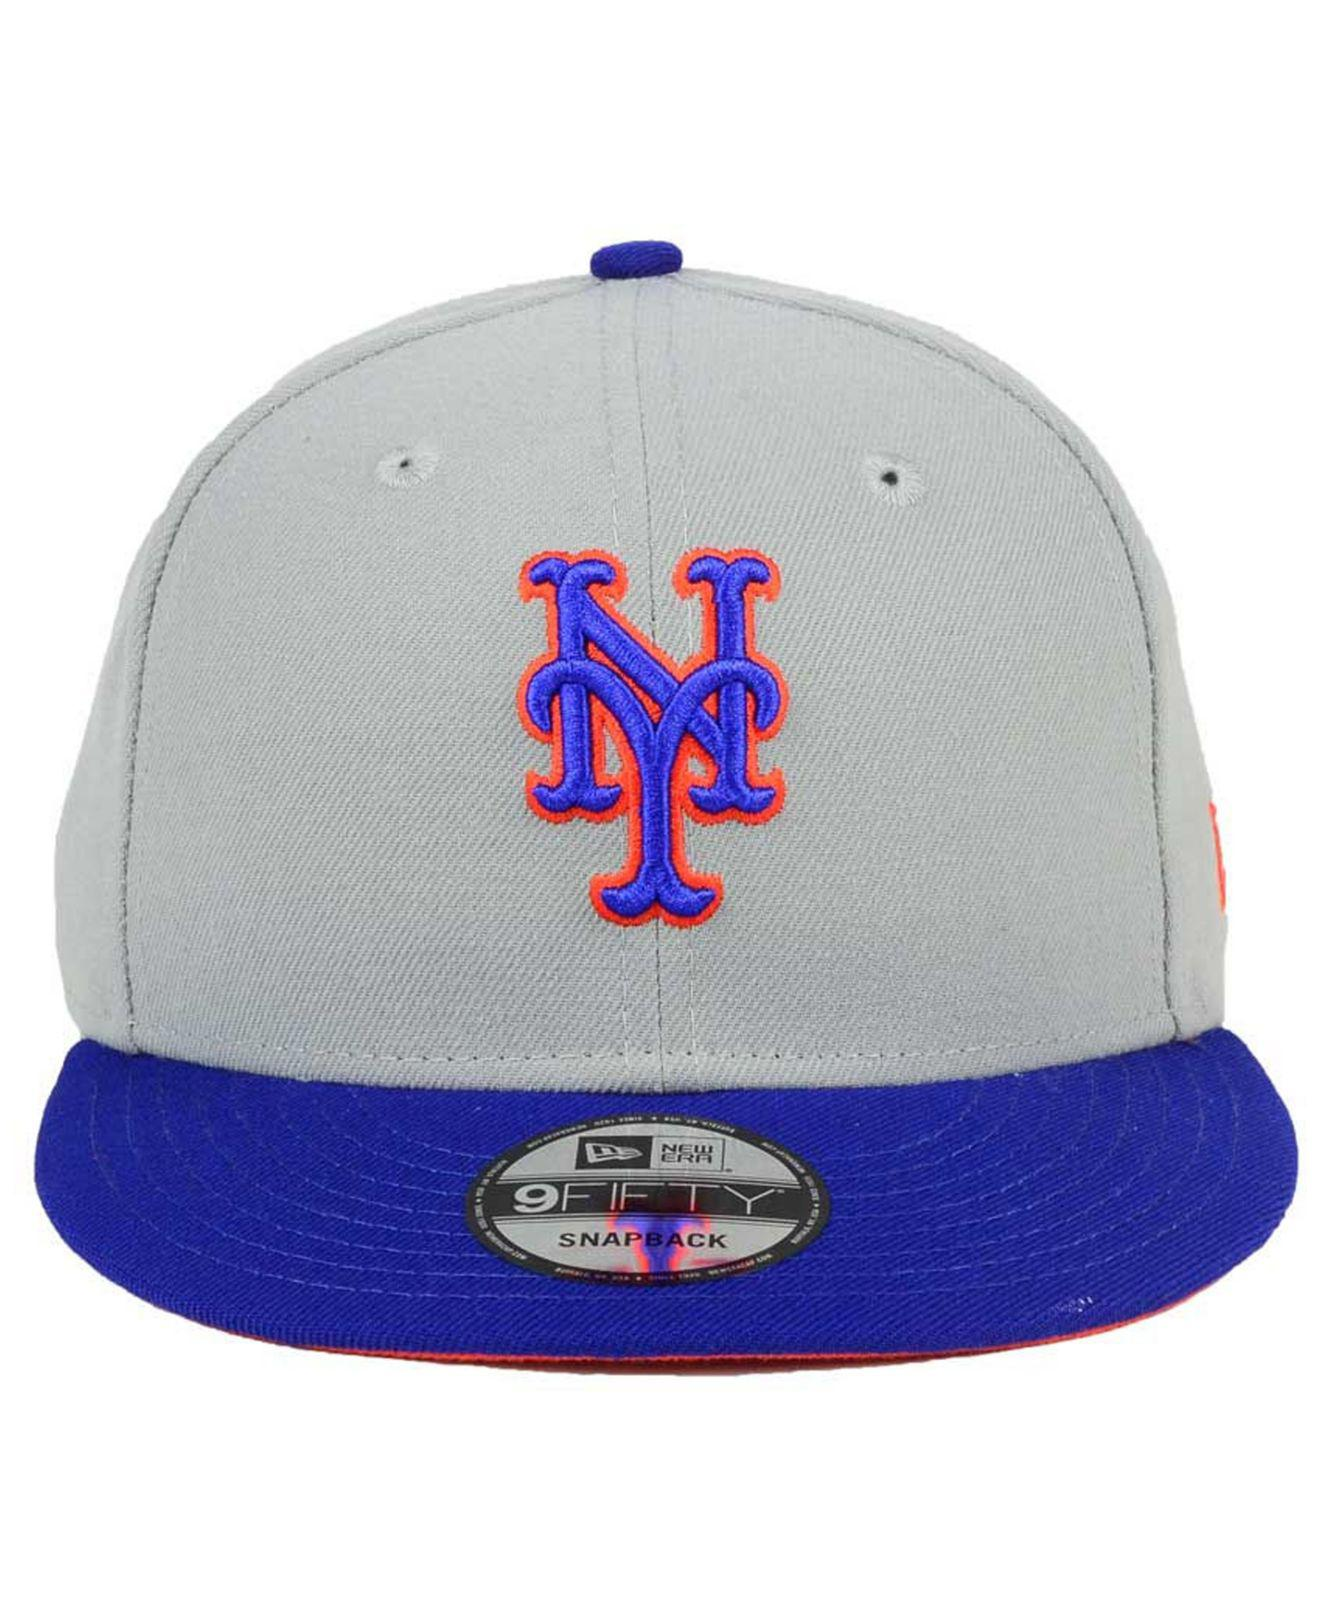 premium selection 1c938 b86d9 Lyst - KTZ New York Mets All Shades 9fifty Snapback Cap for Men